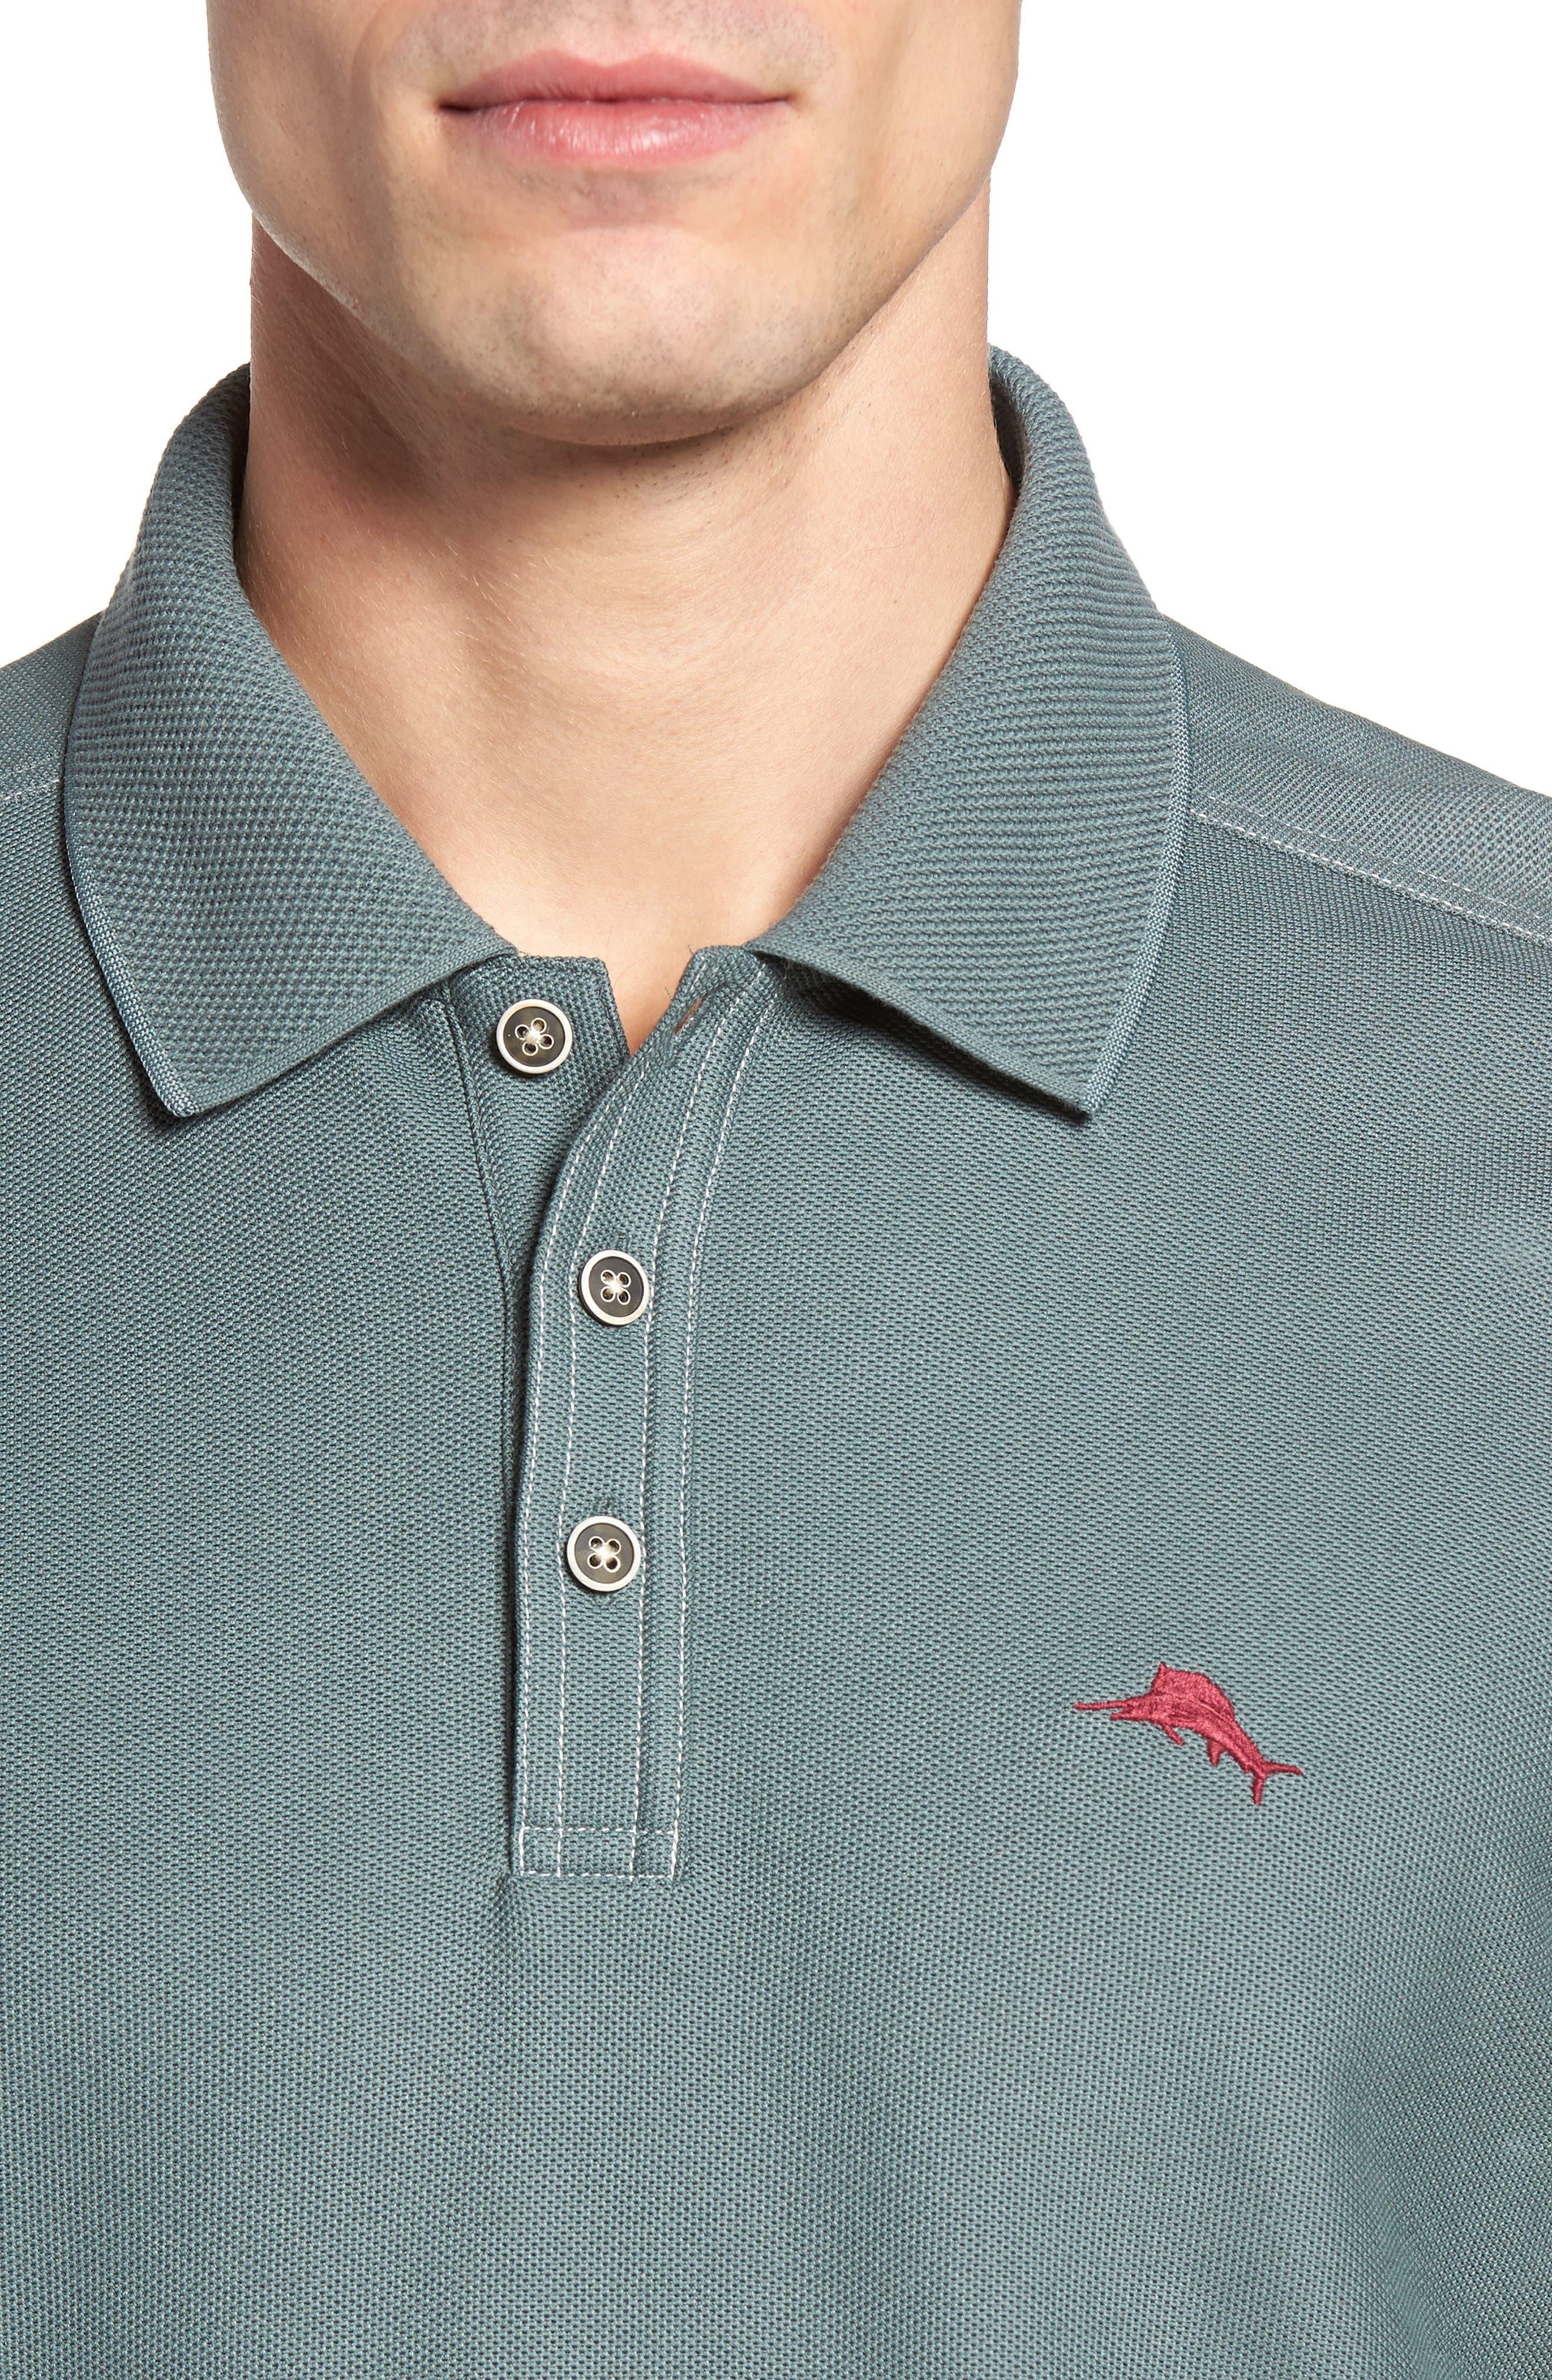 Emfielder Long Sleeve Polo,                             Alternate thumbnail 42, color,